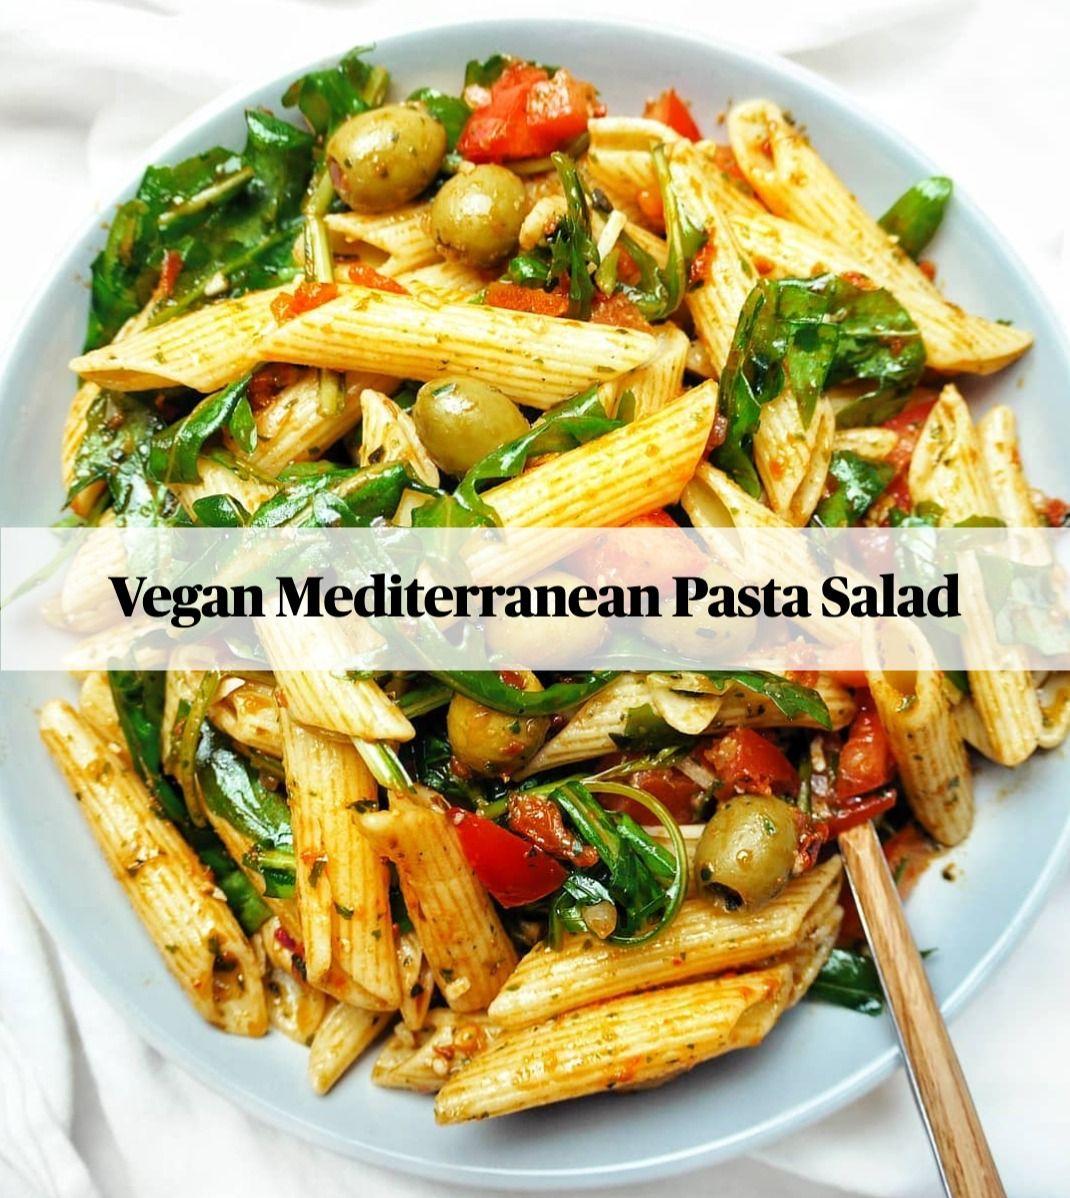 Photo of Vegan Mediterranean Pasta Salad